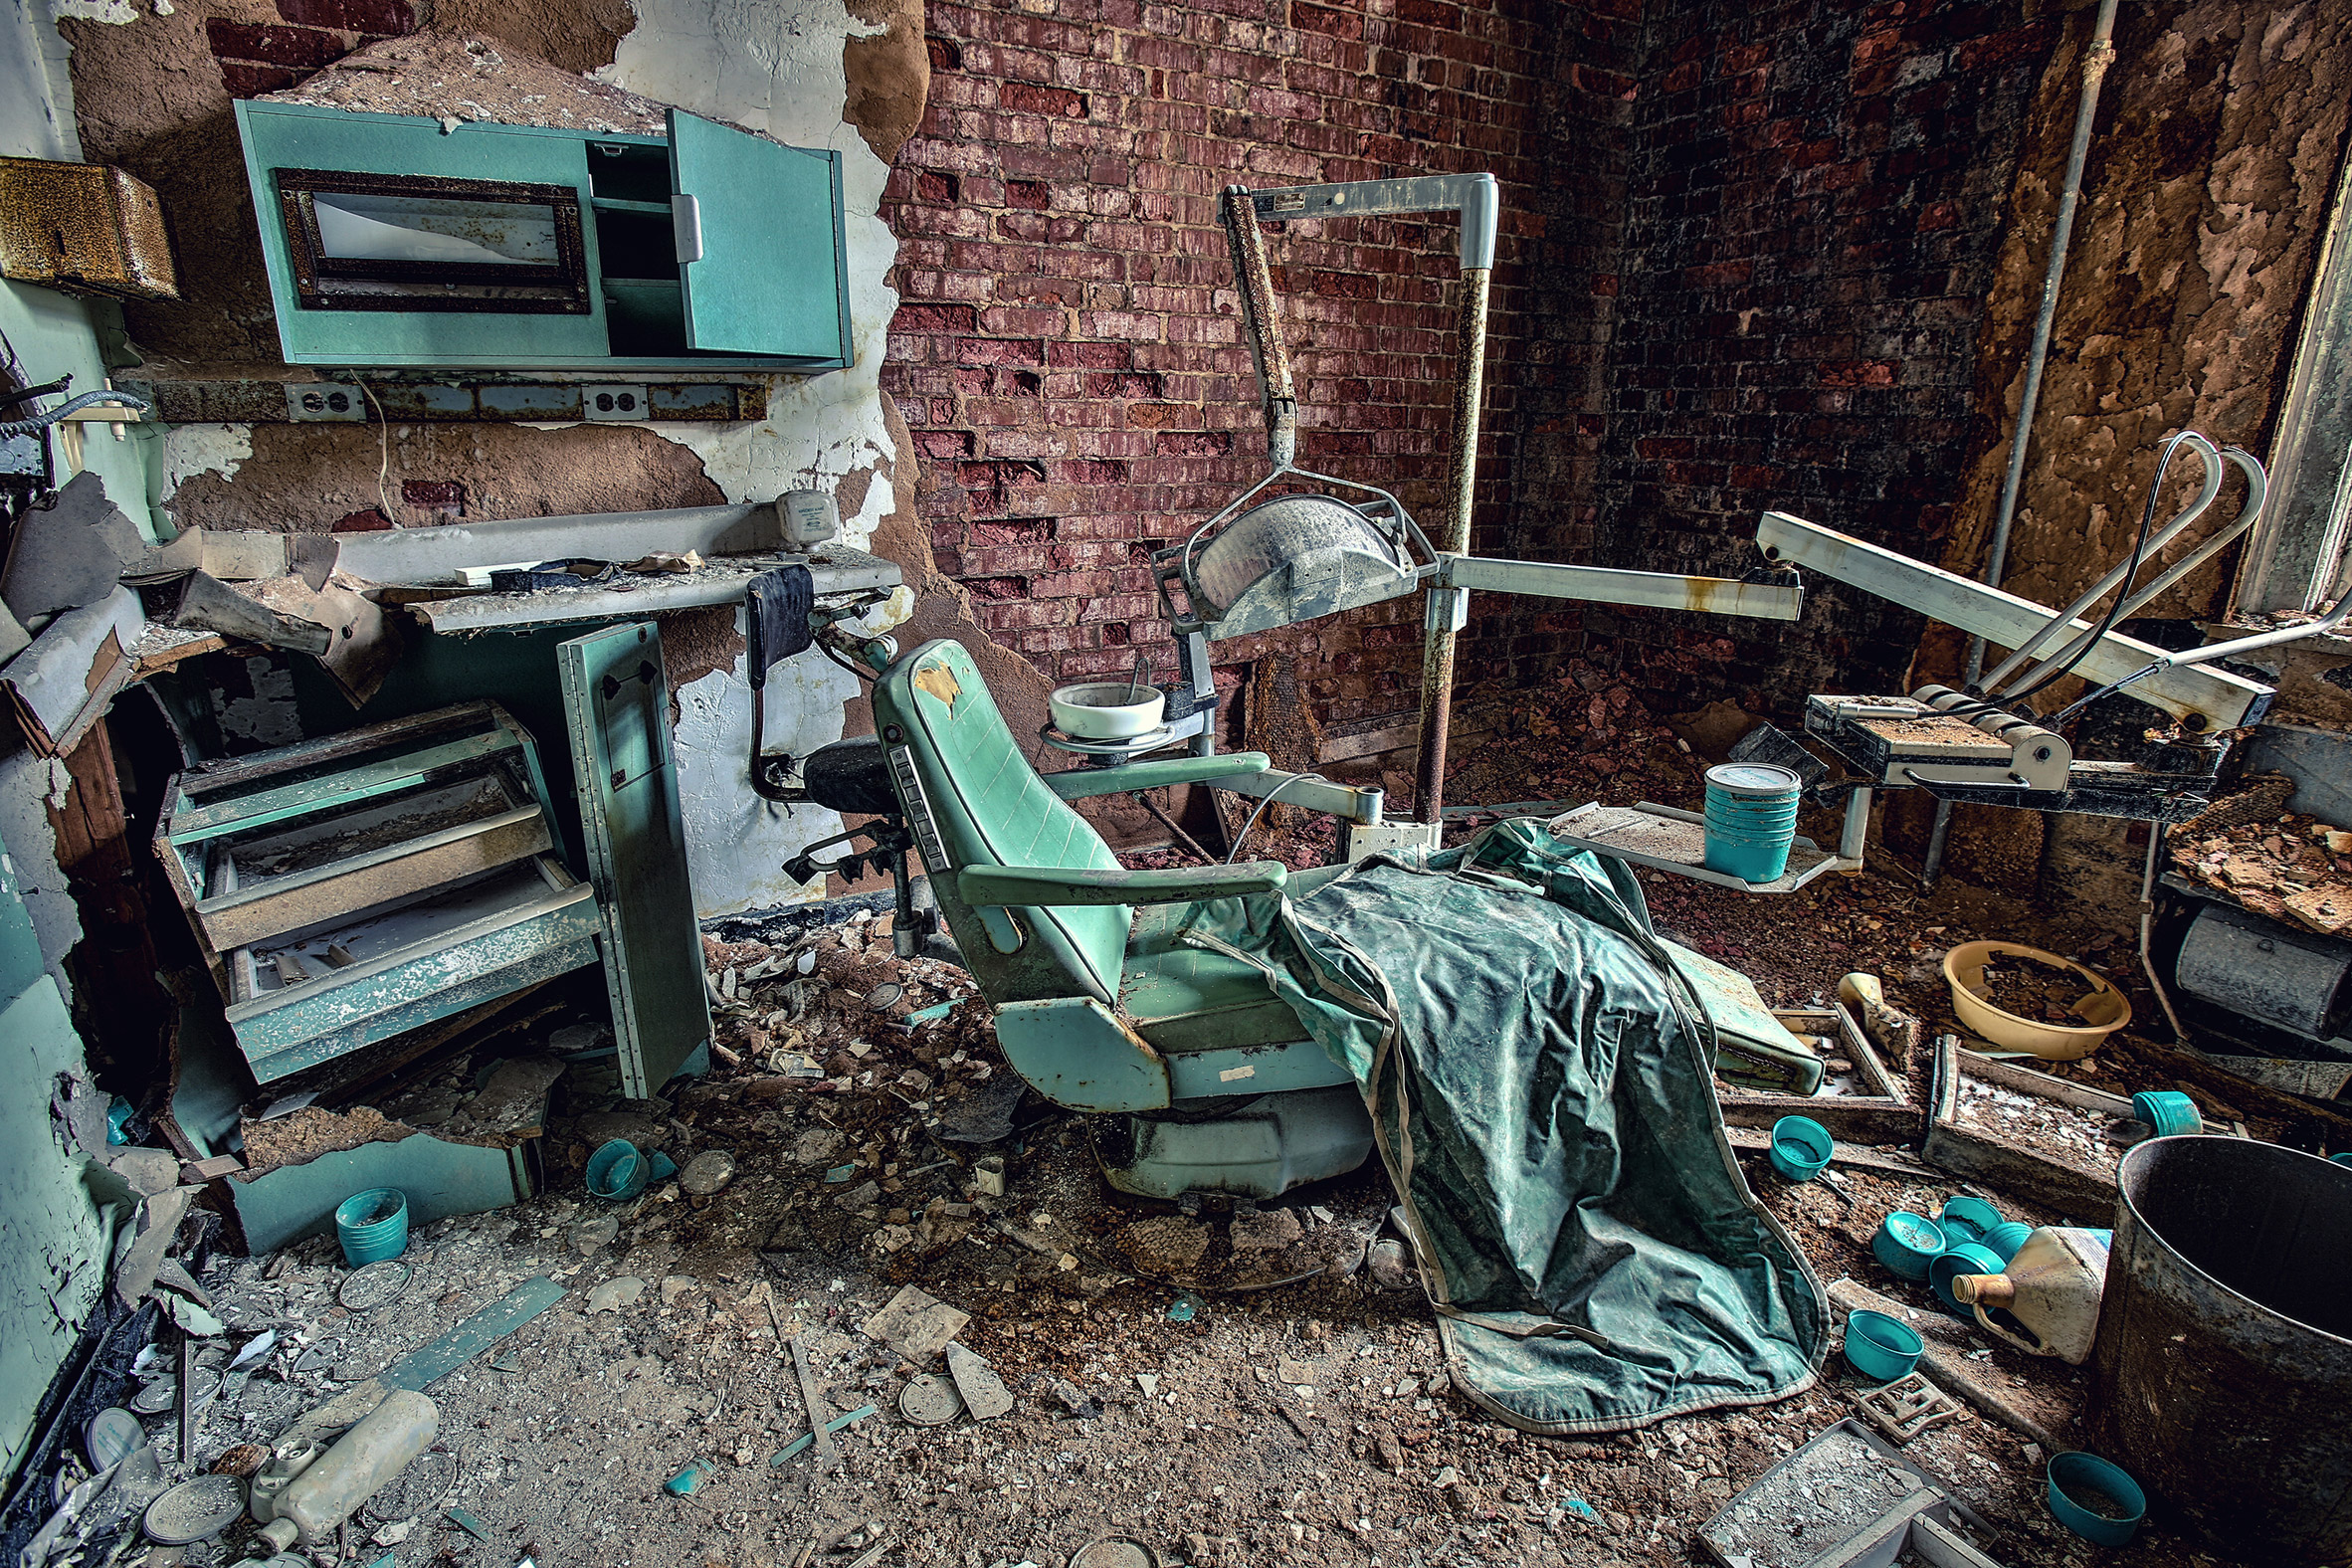 Abandoned-Asylums-3.jpg